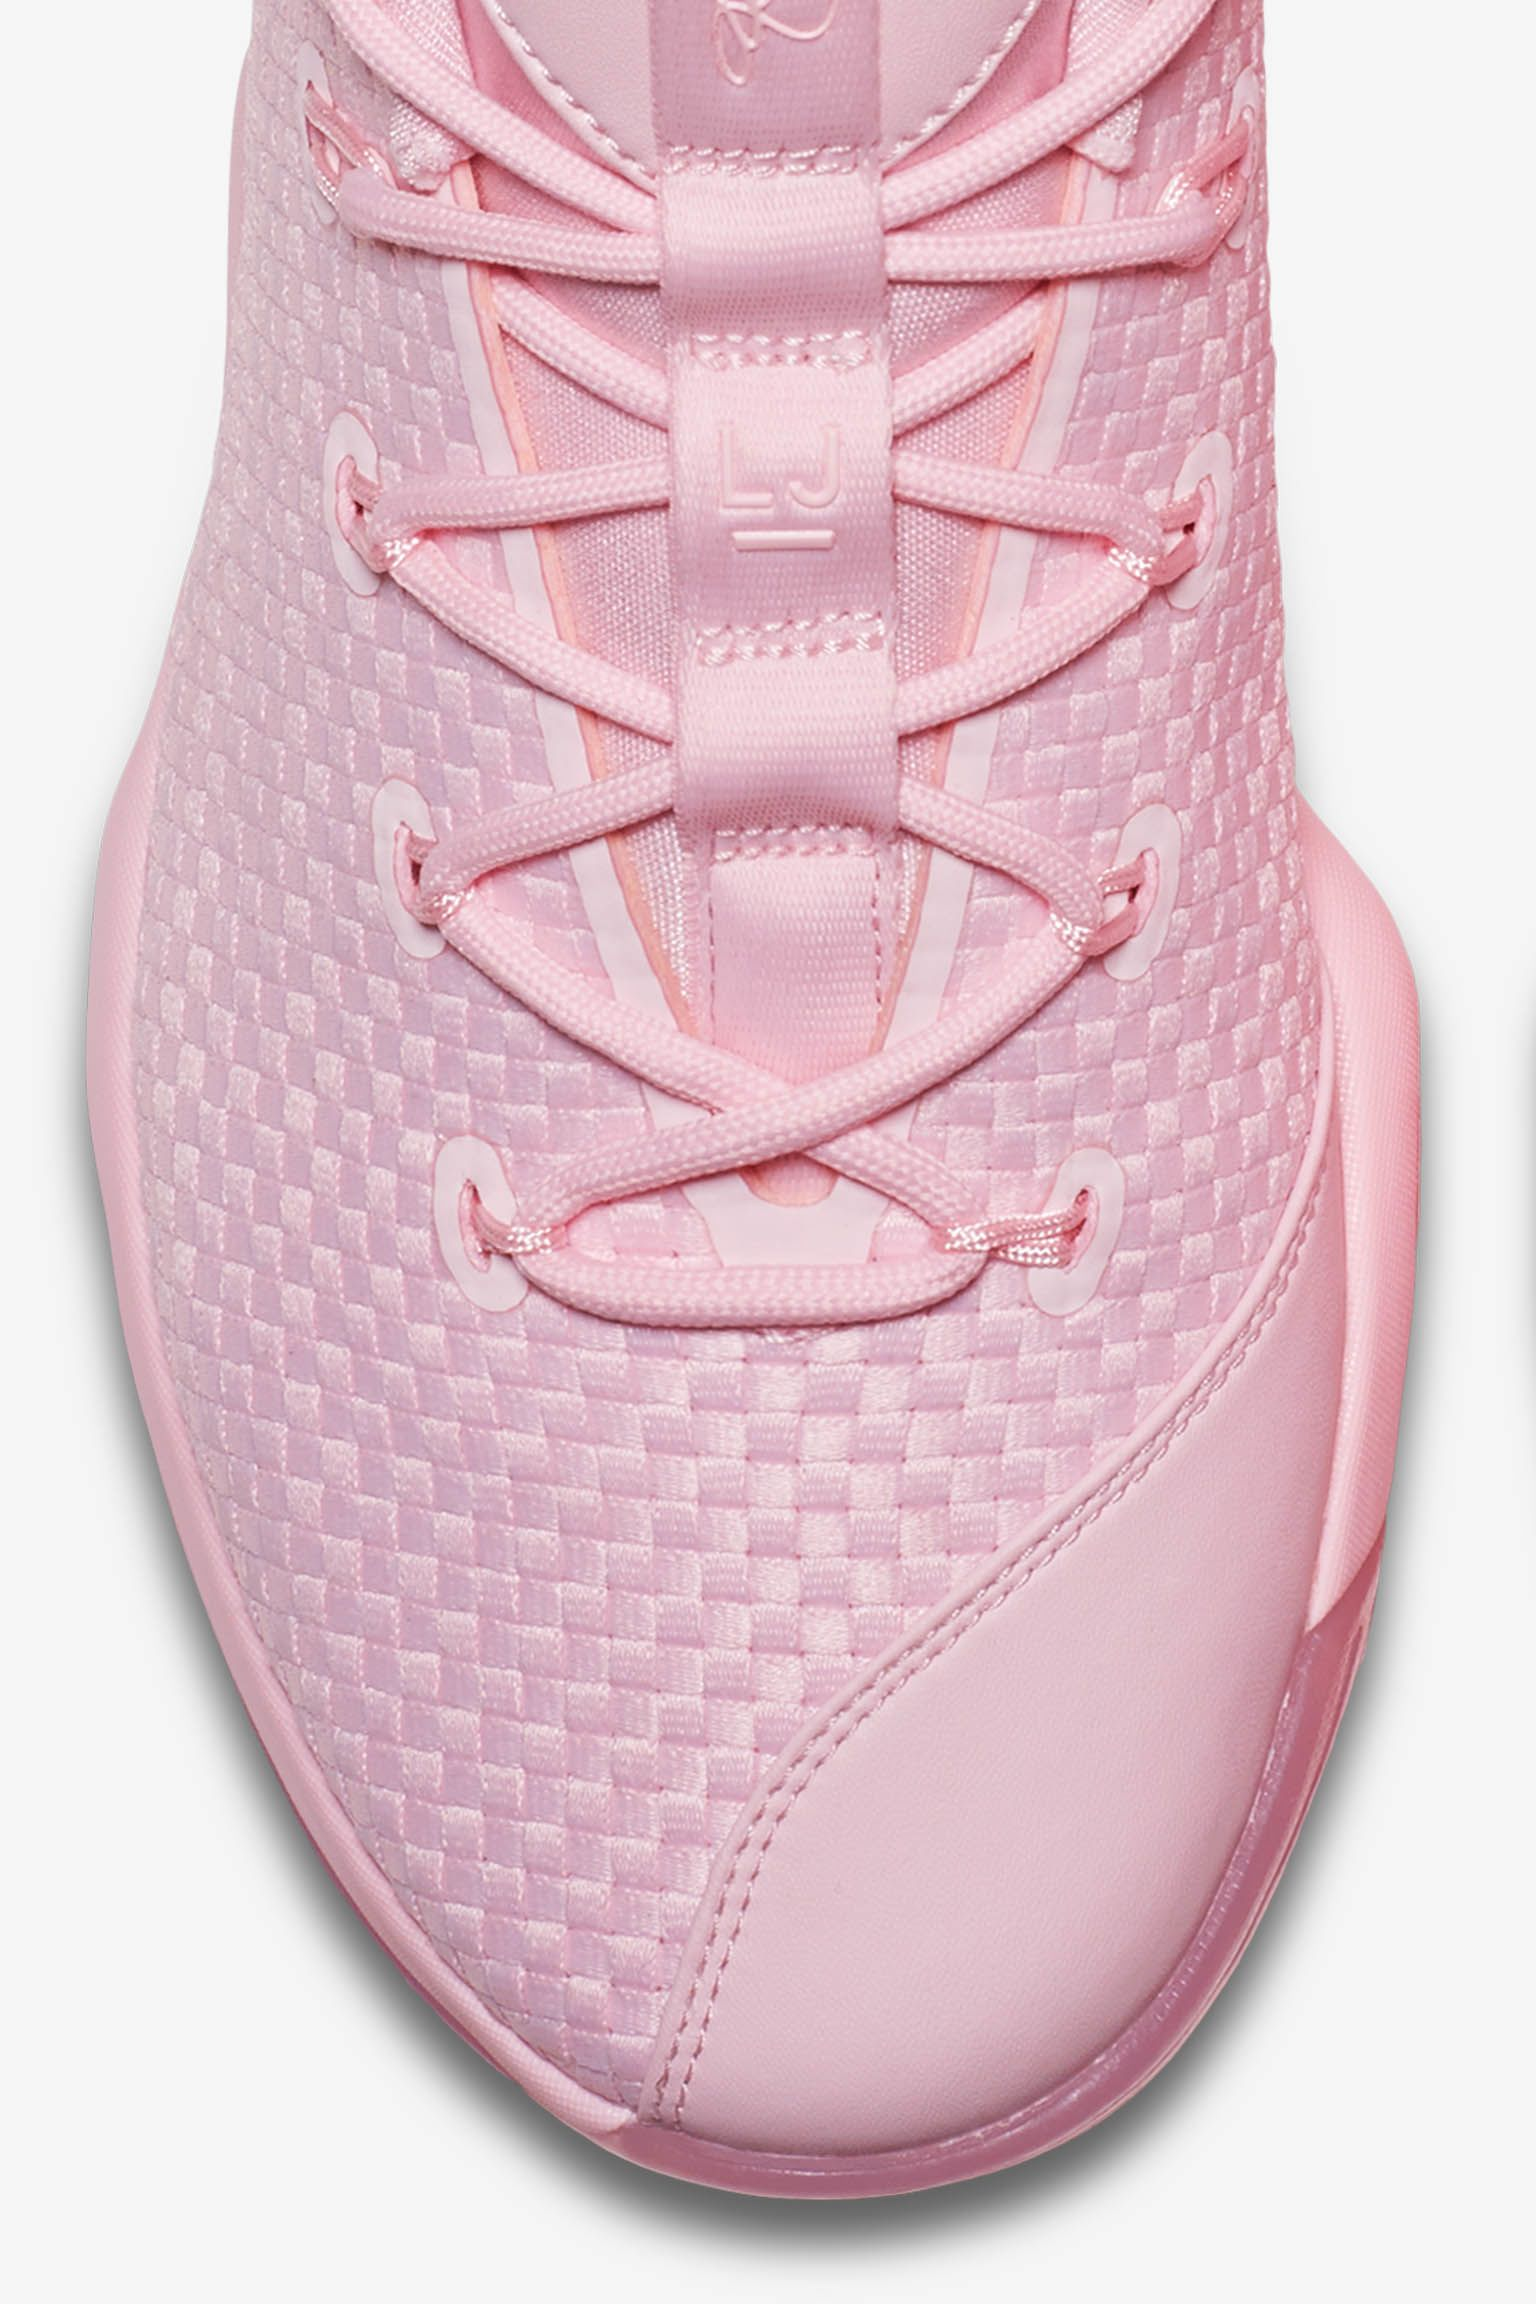 Nike Lebron 14 Low Prism